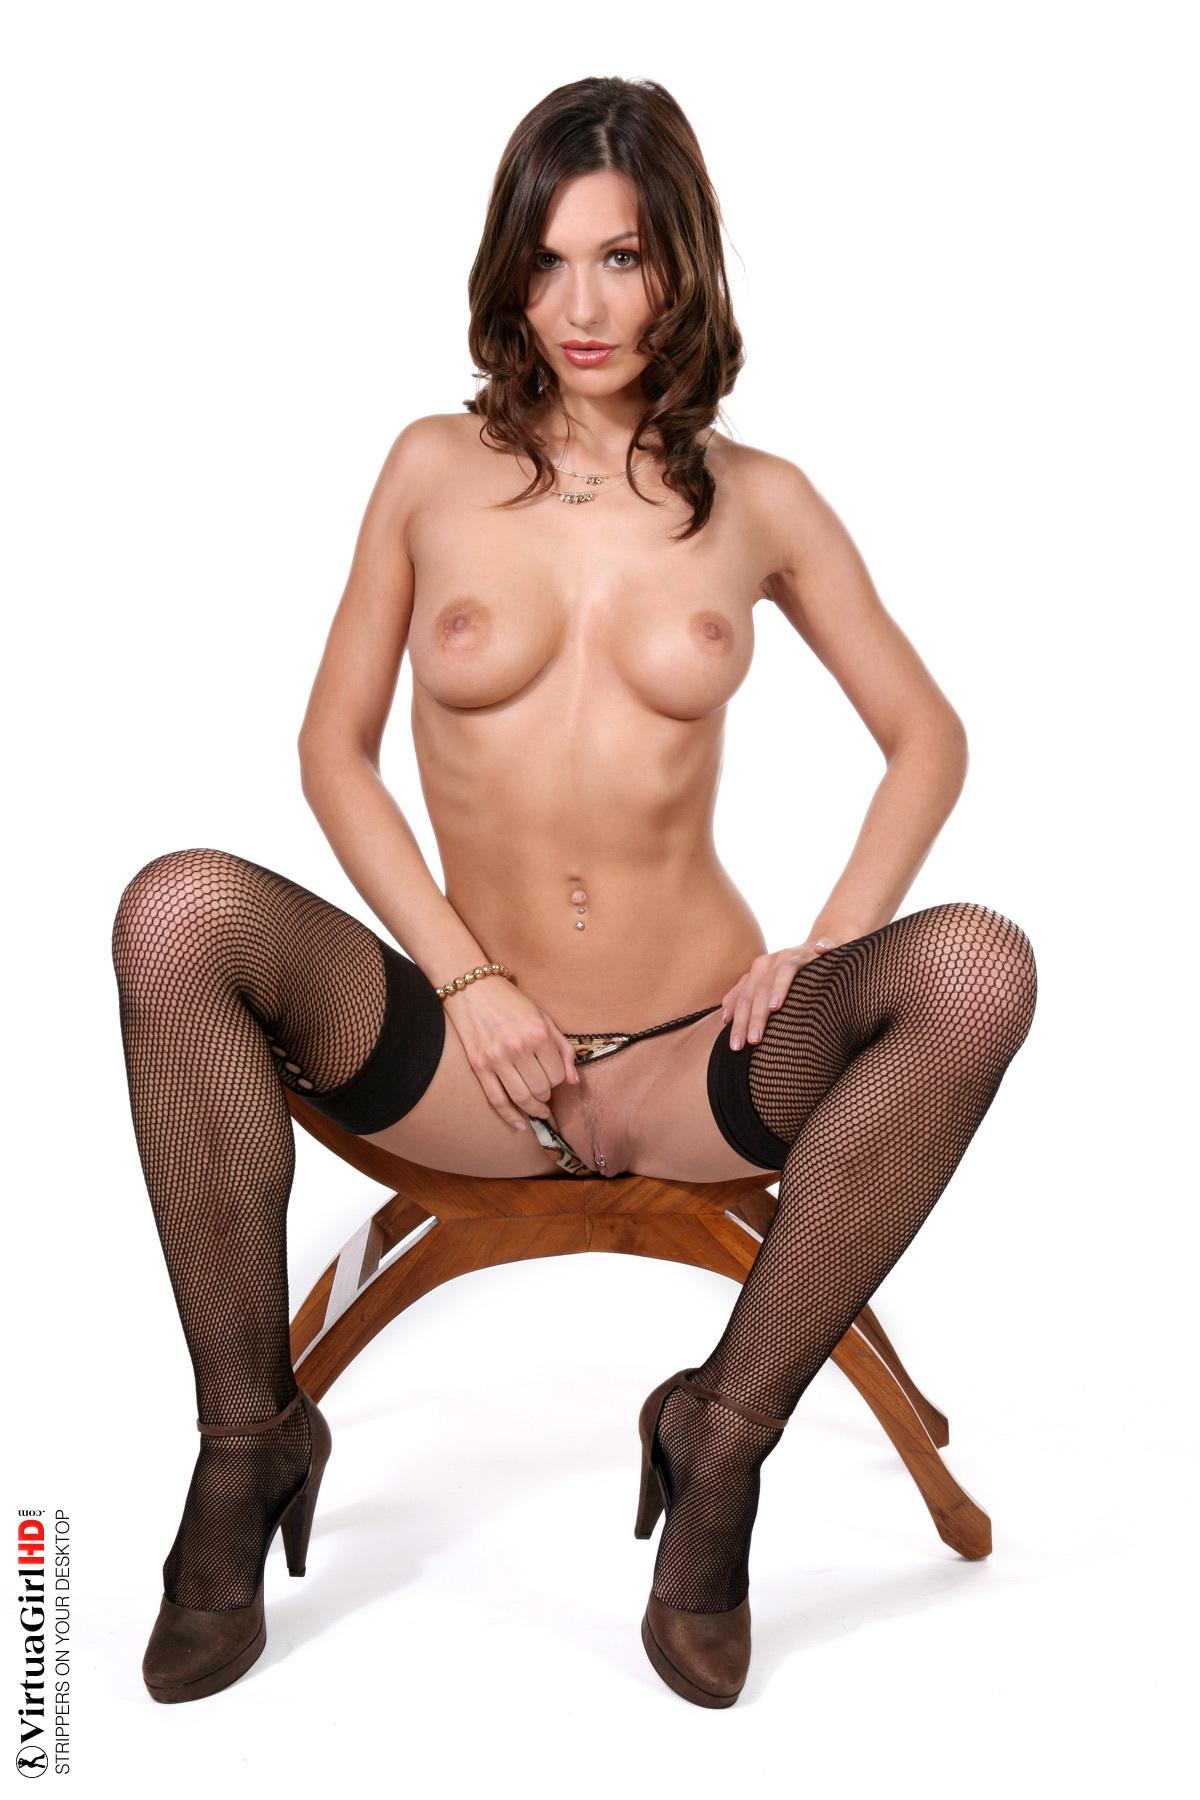 girls stripping off bras